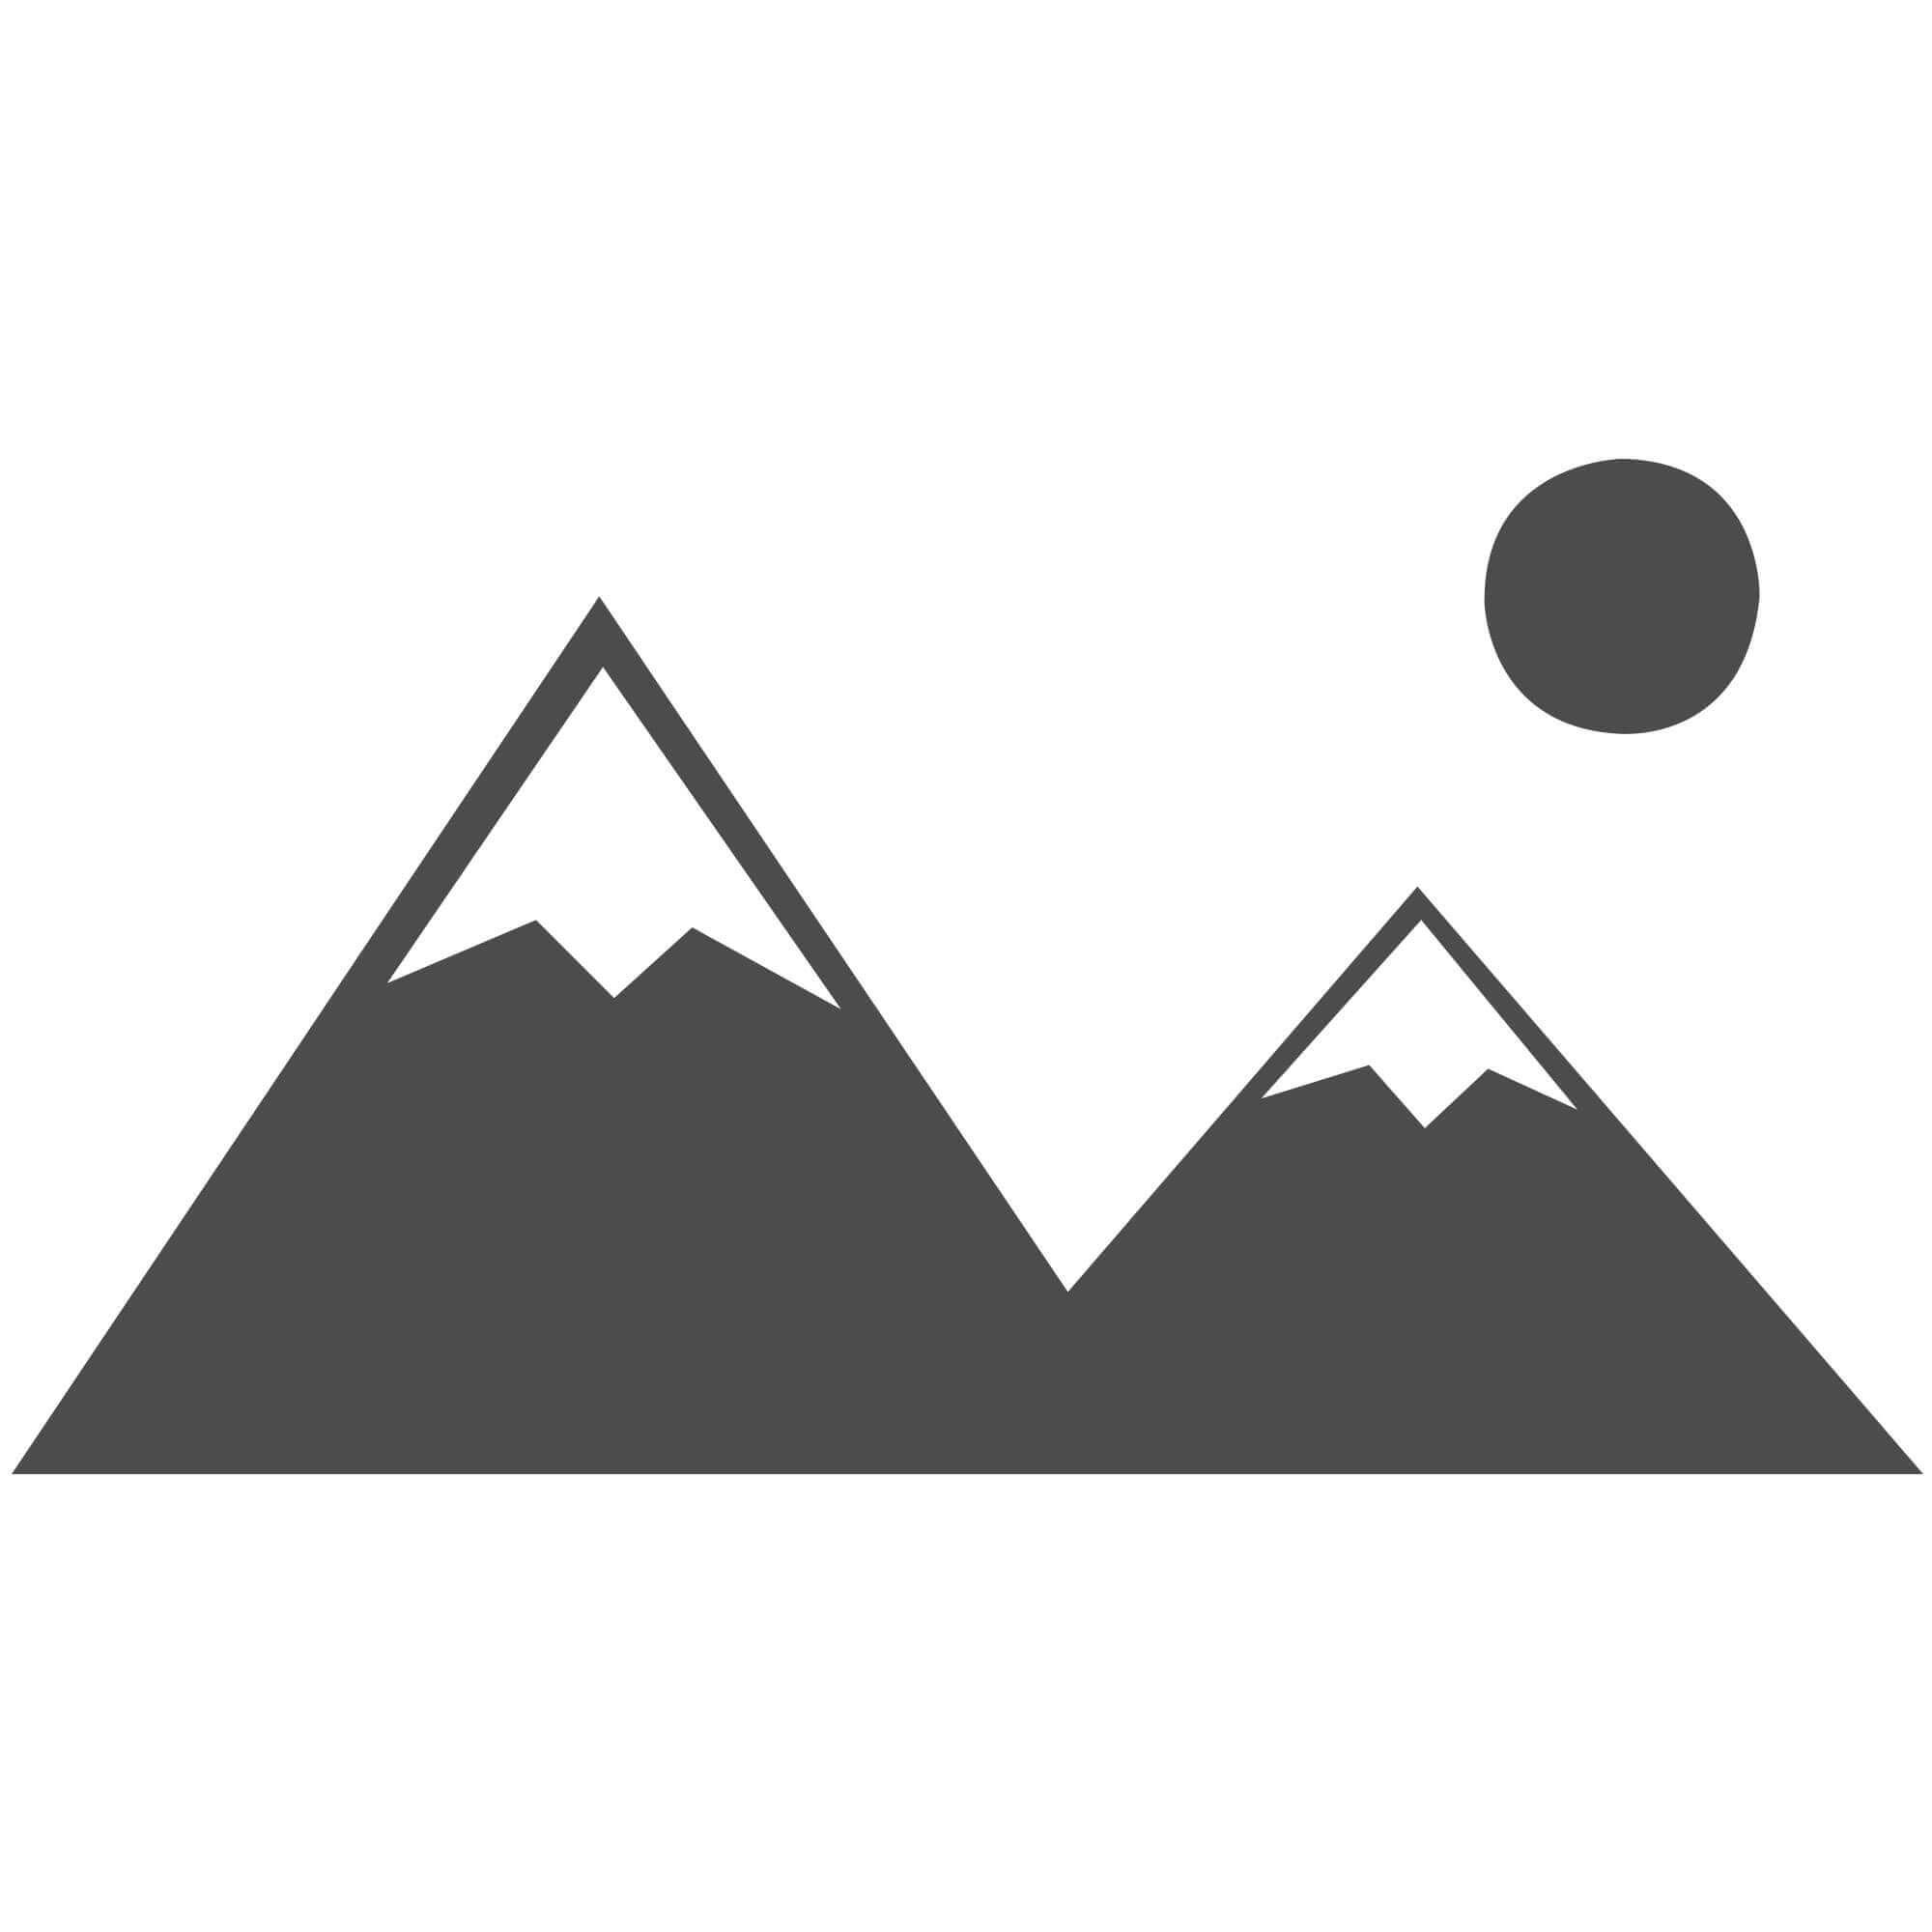 "Arabesque Moroccan Pattern Wool Rug - Grey-Runner 68 x 235 cm (2'3"" x 7'9"")"